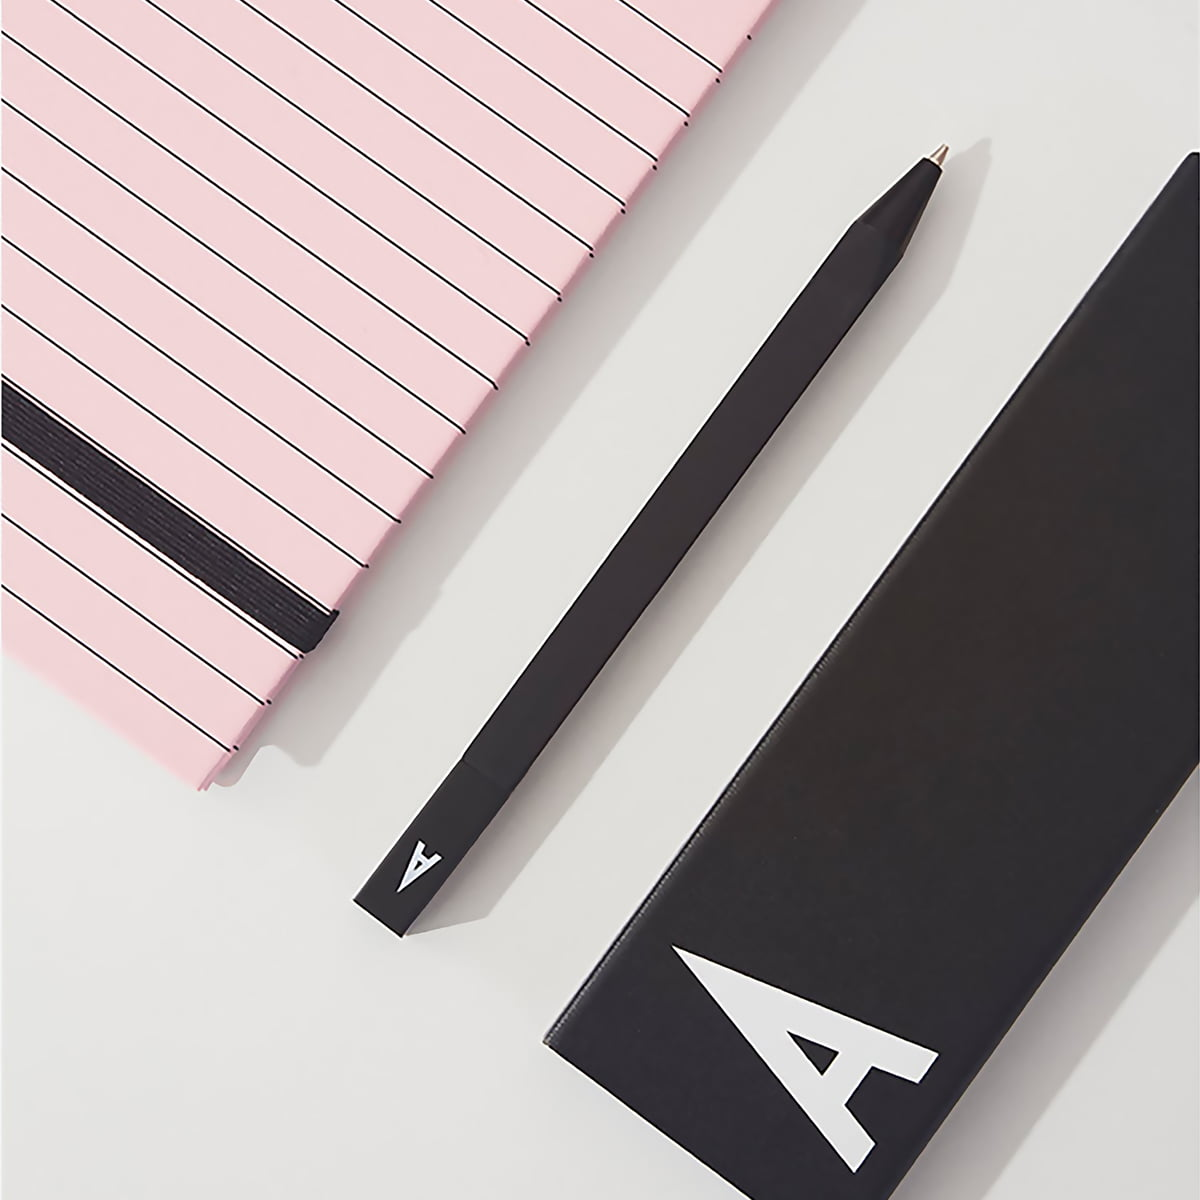 Personal Pen, Personal Pencil Case